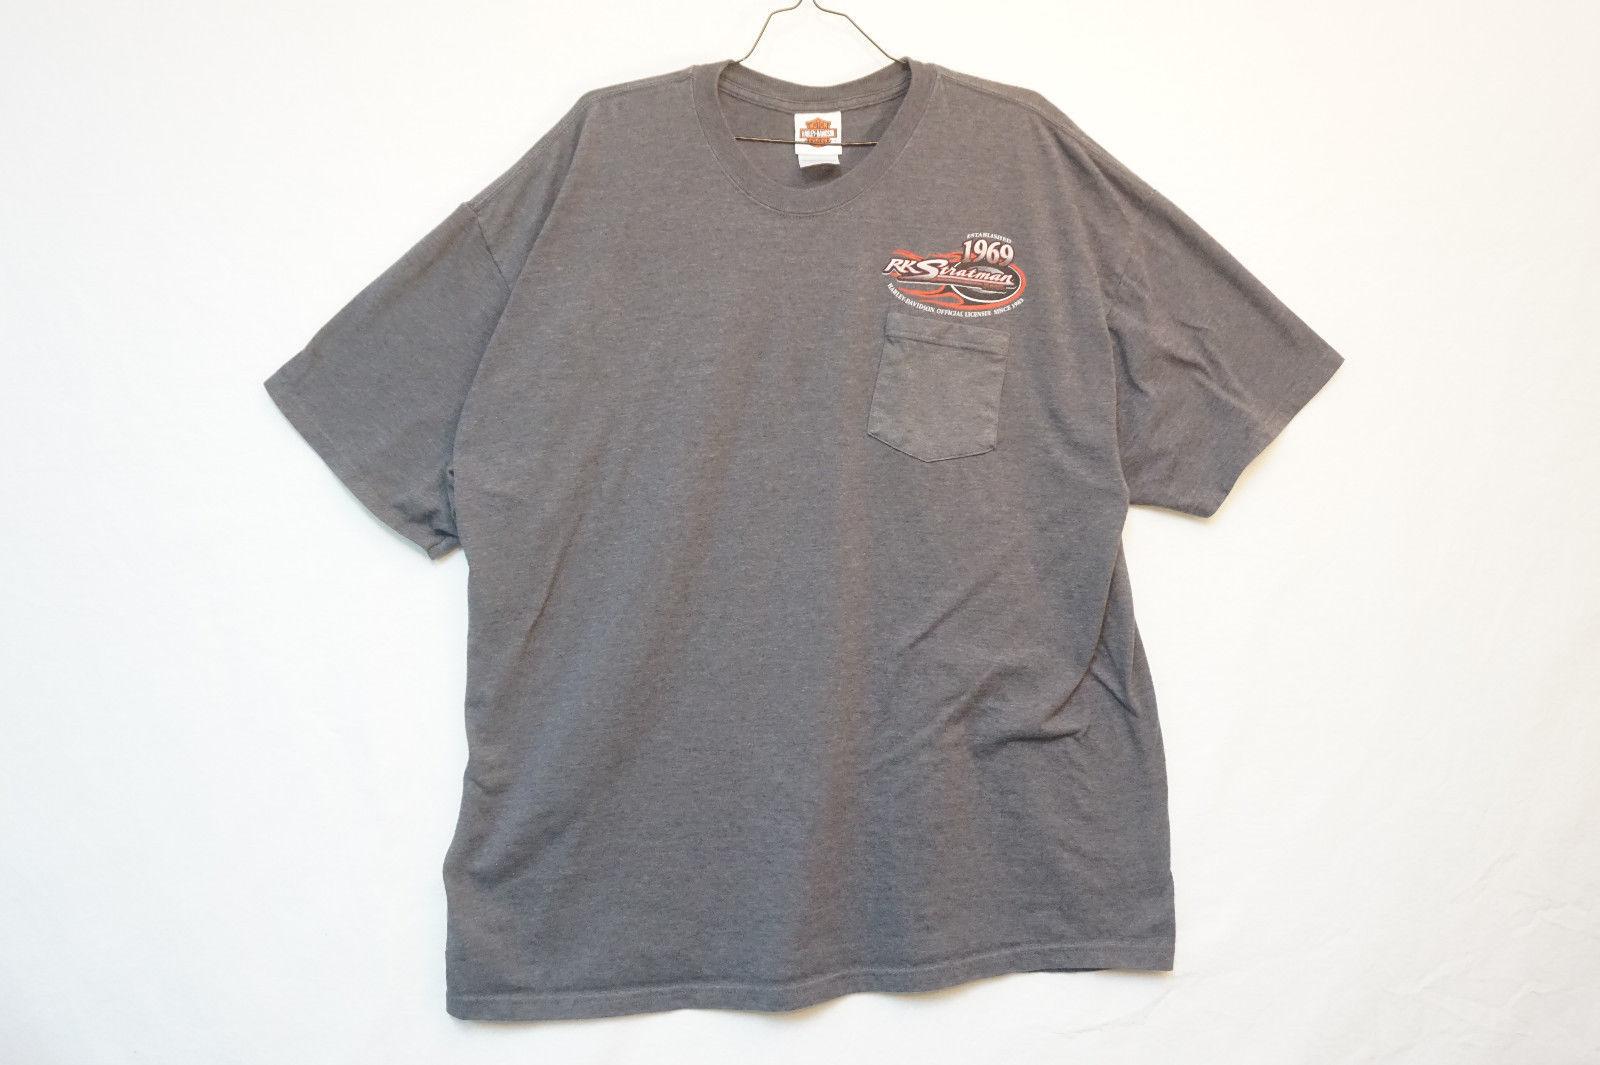 Harley RK Stratman Midweight Cotton T-Shirt, Gray, Men's 2XL 7721 image 2